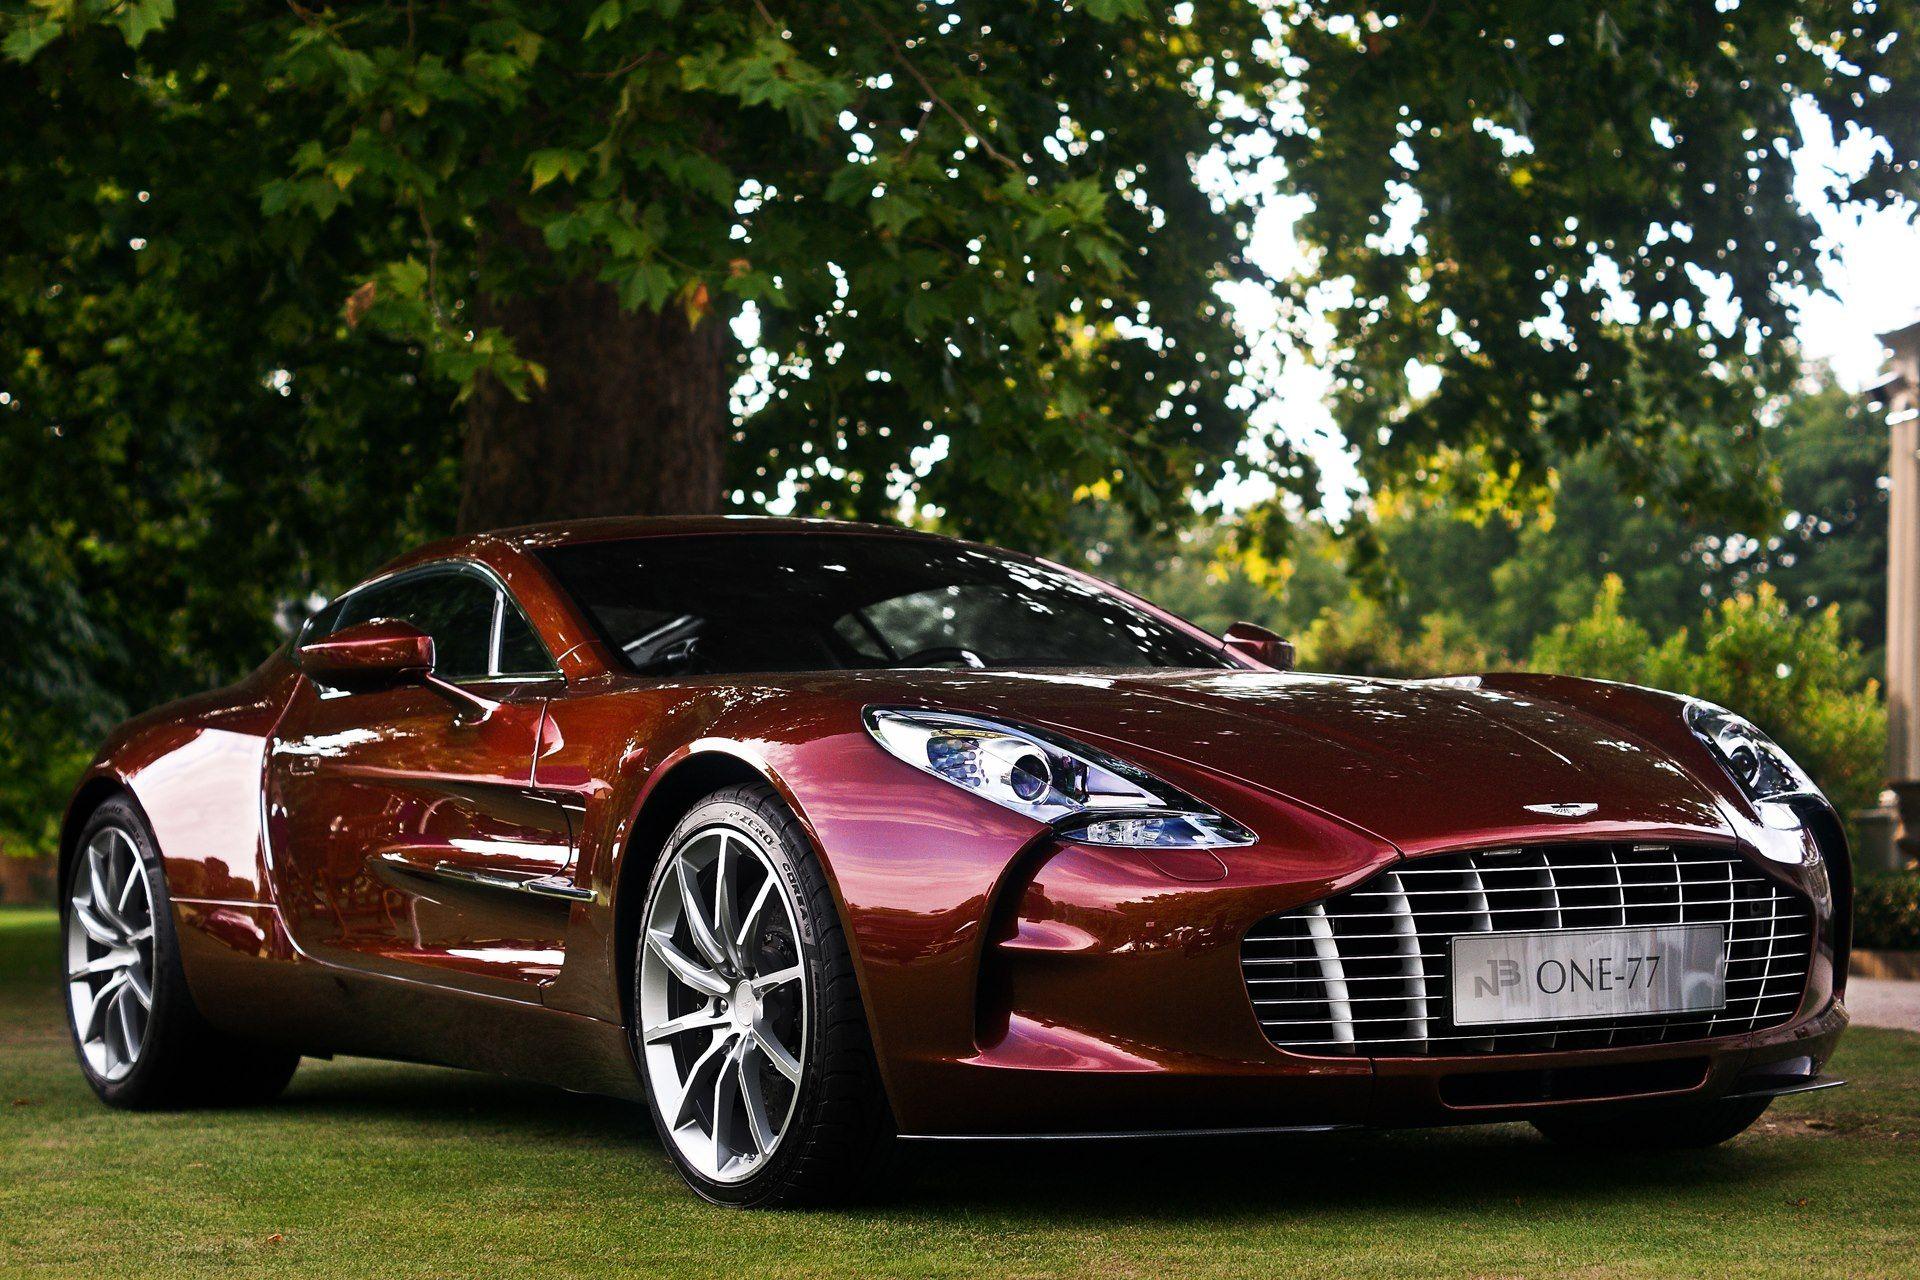 Pin By Cliff Poris On Hot Wheels Aston Martin Cars Aston Martin Expensive Cars